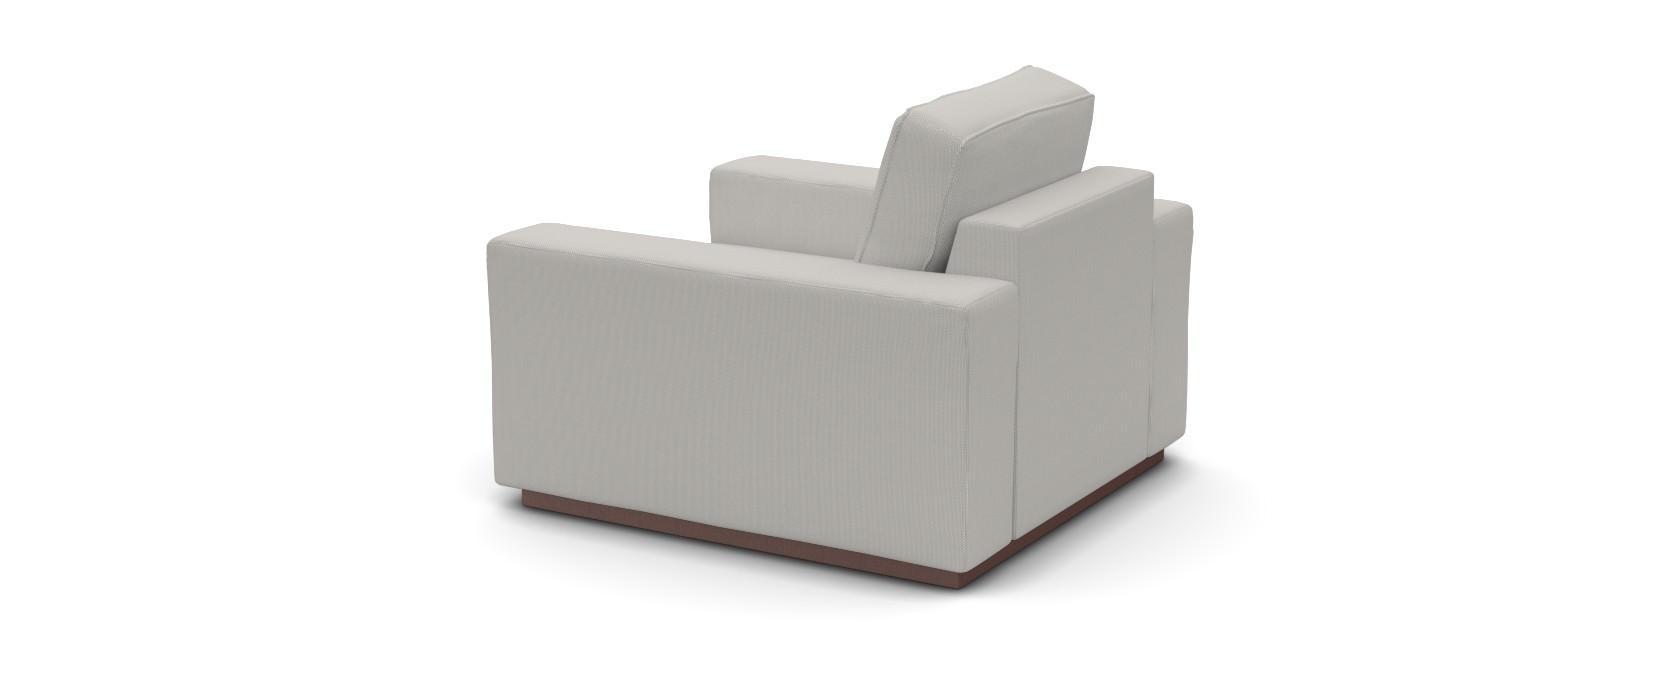 Sessel Milano Lounge